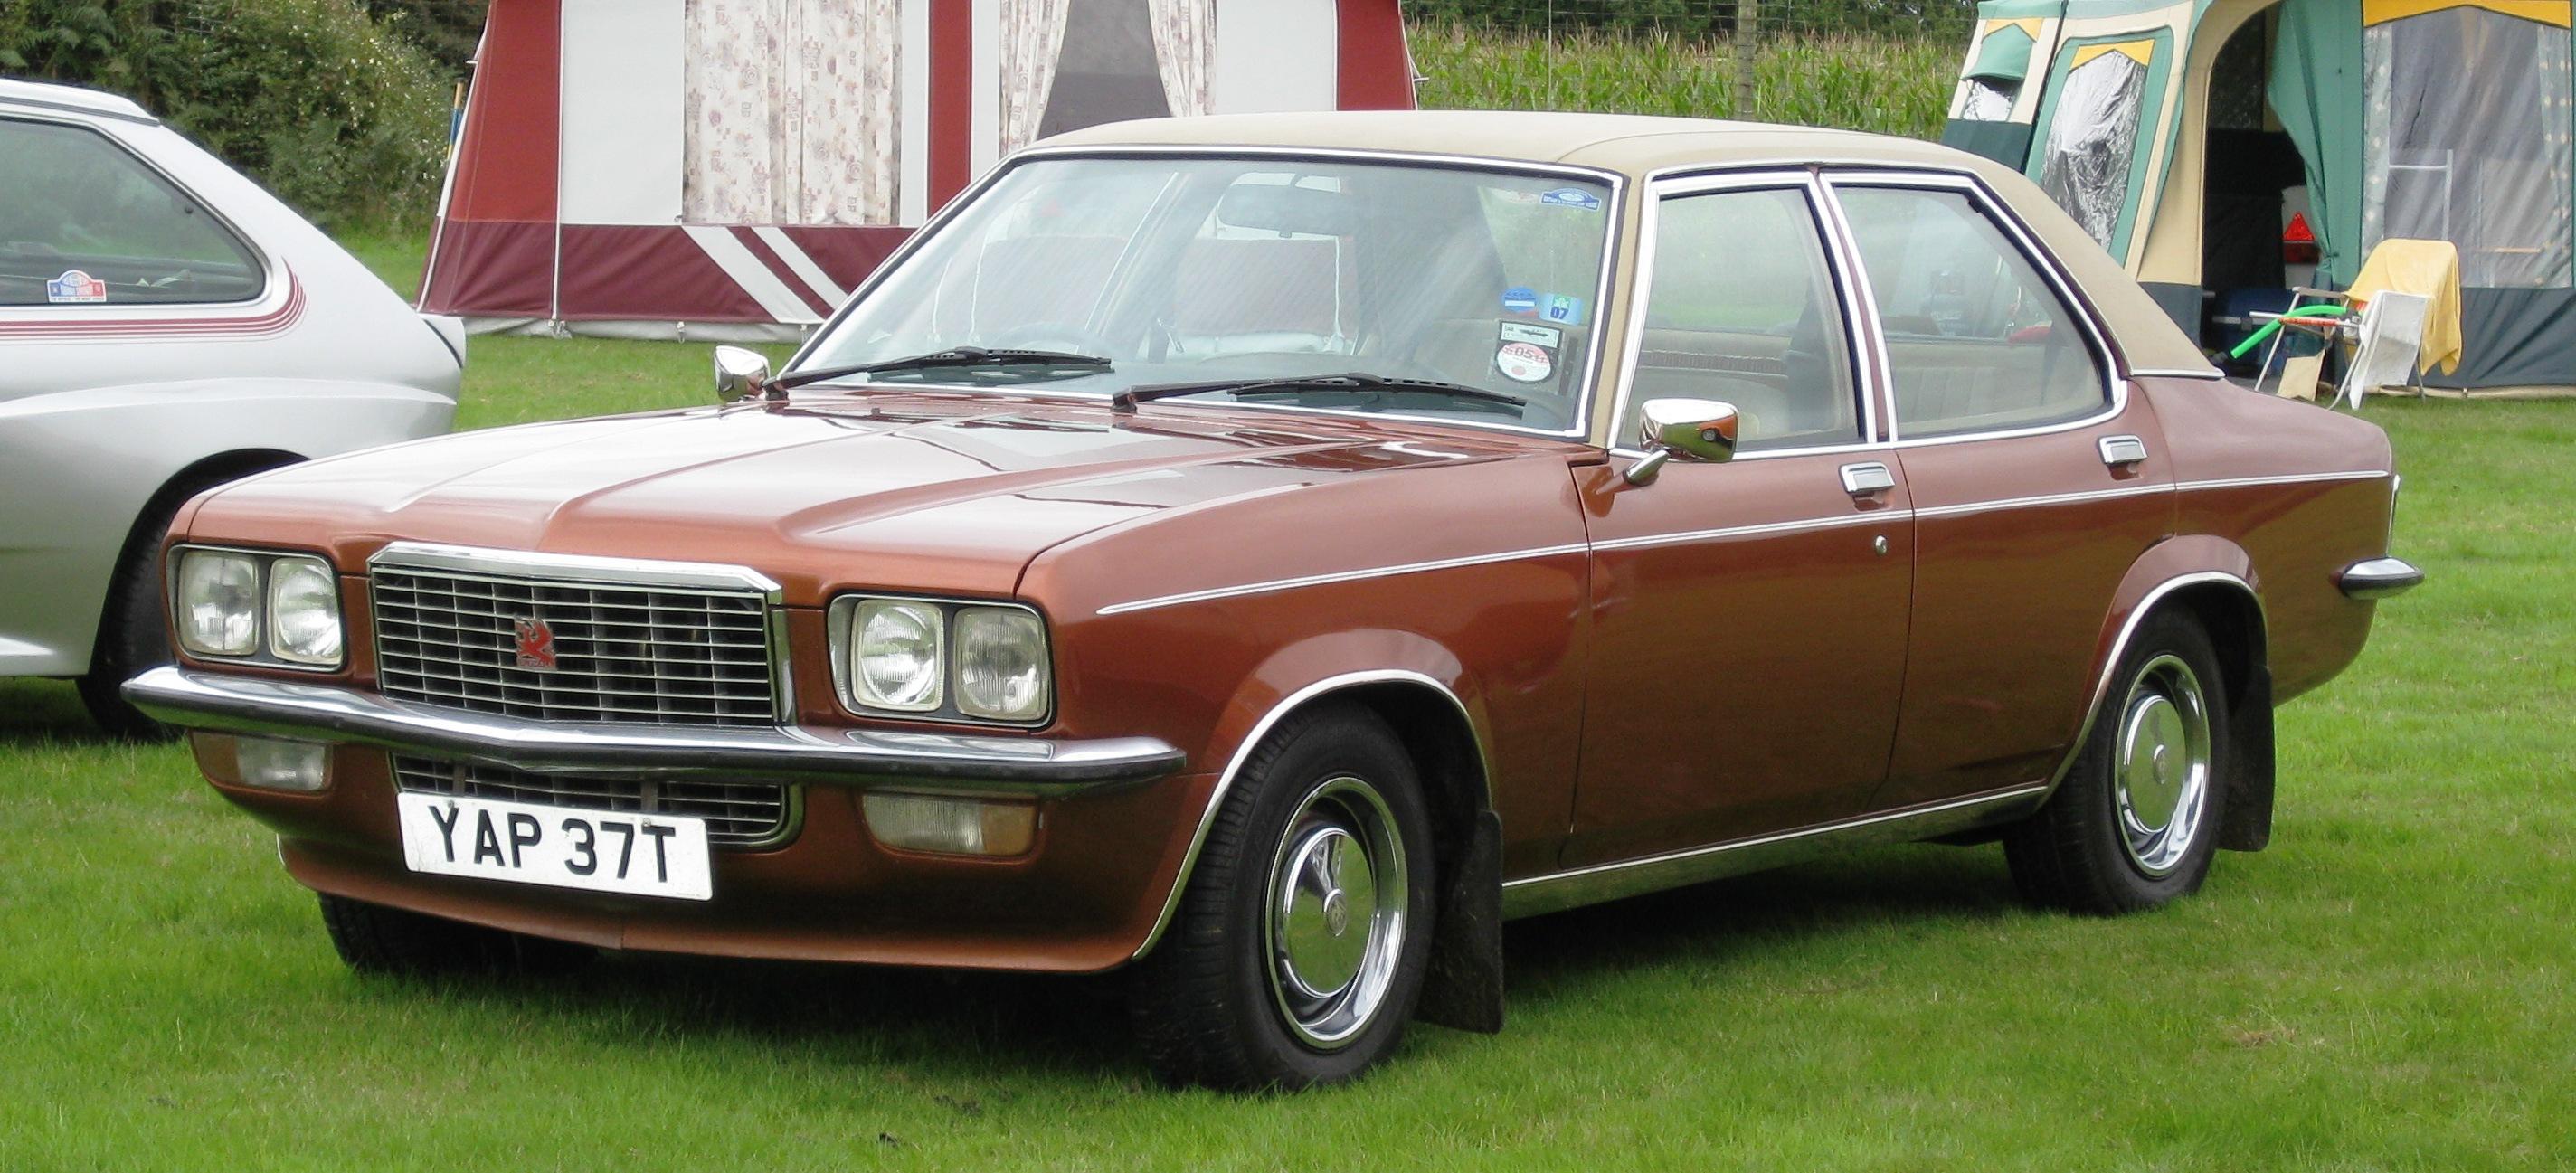 File:Vauxhall VX 2300 GLS 2279cc September 1978.JPG - Wikimedia ...